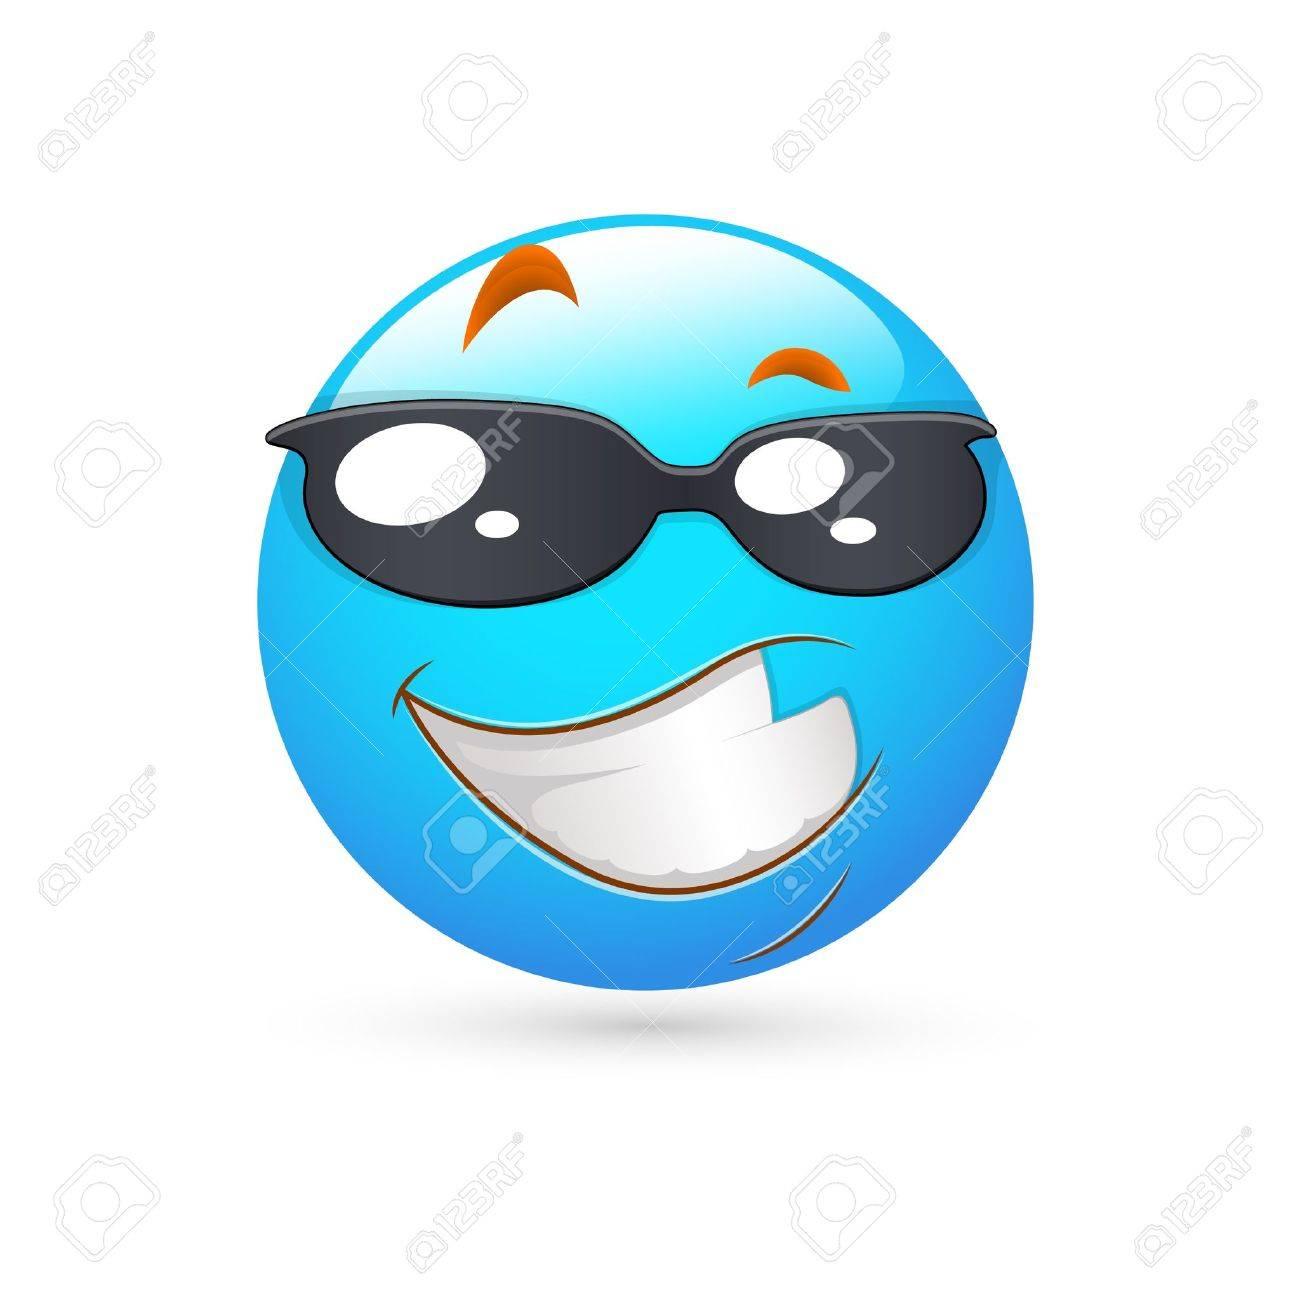 Smiley Emoticons Face Vector - Smart Expression Stock Vector - 15808696